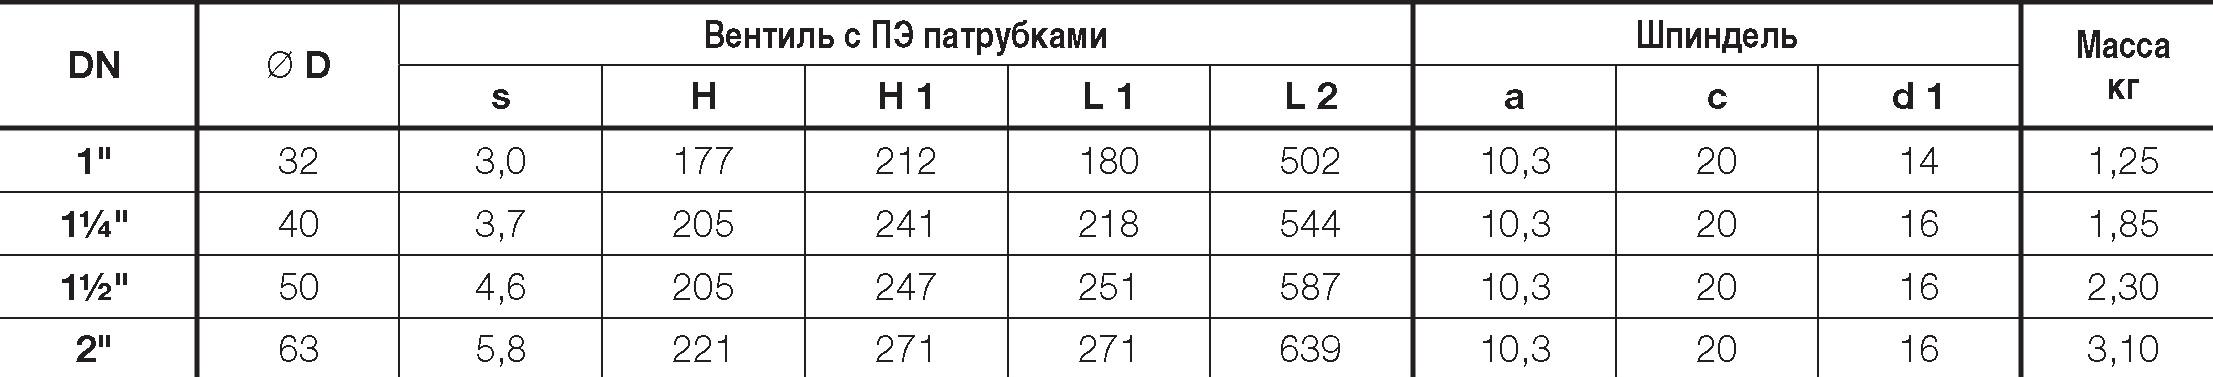 Таблица характеристик для Вентиль Hawle 2670 с ПЭ патрубками для сварки DN32